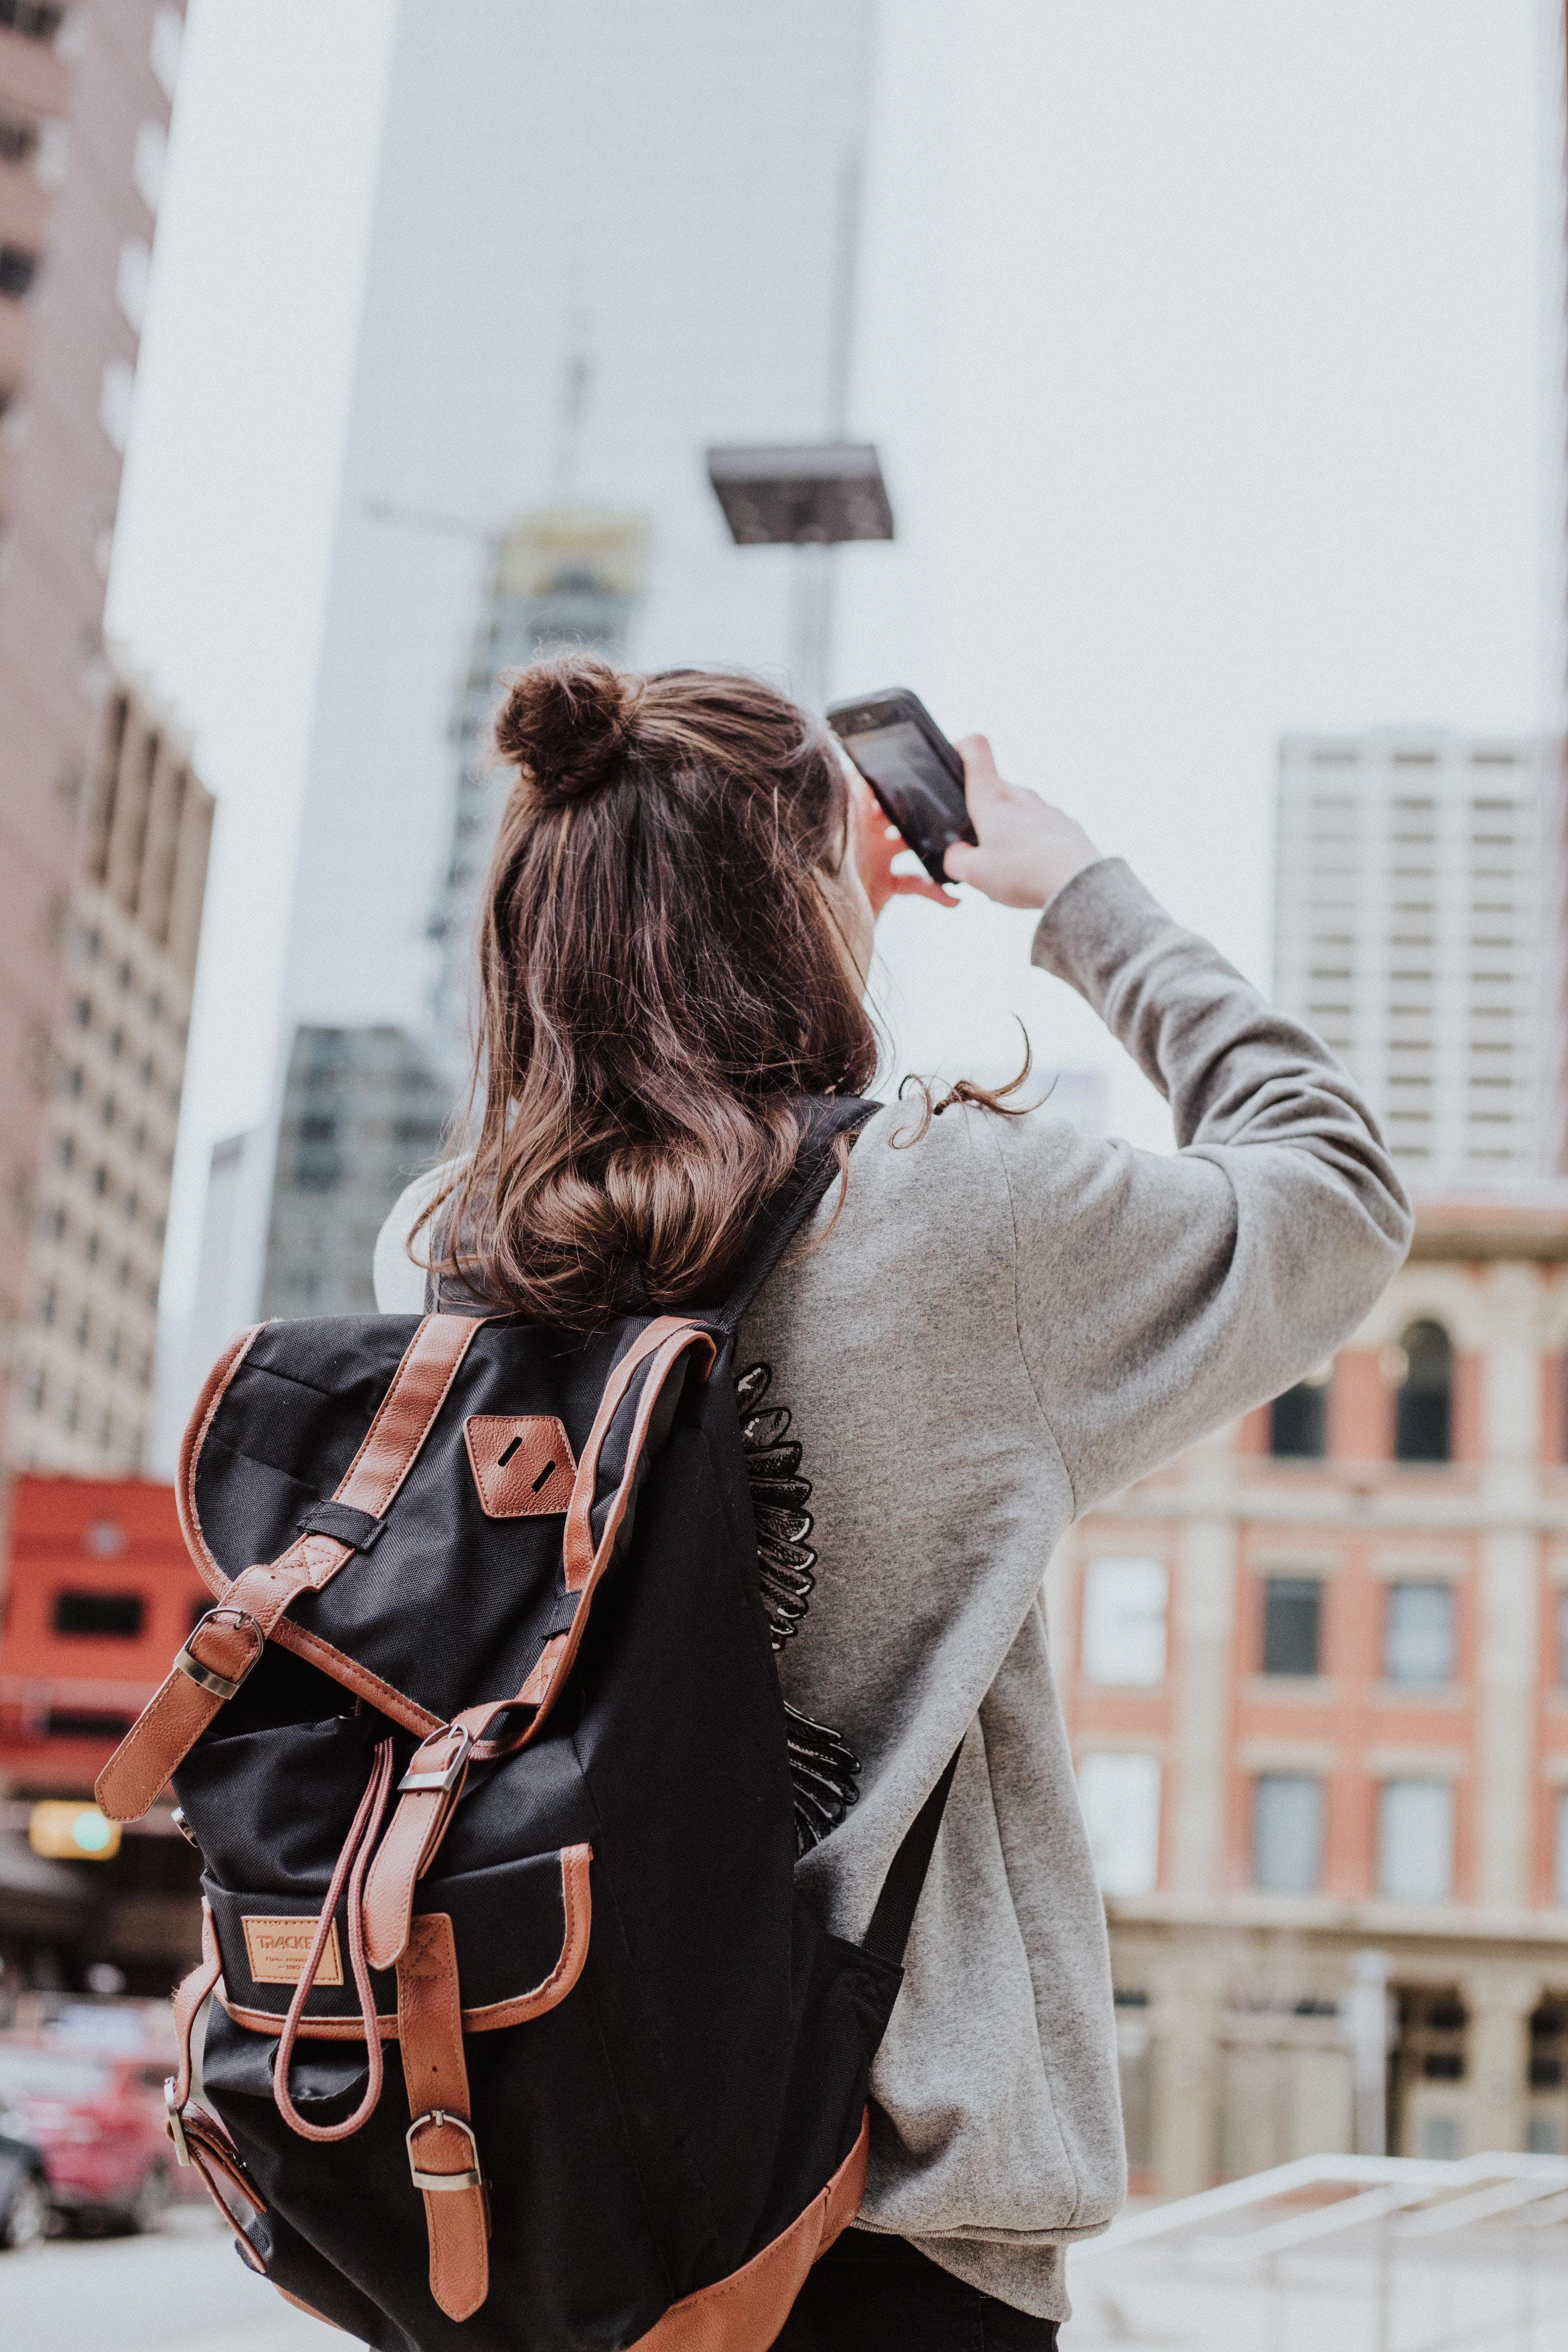 Understanding Teens and Social Media